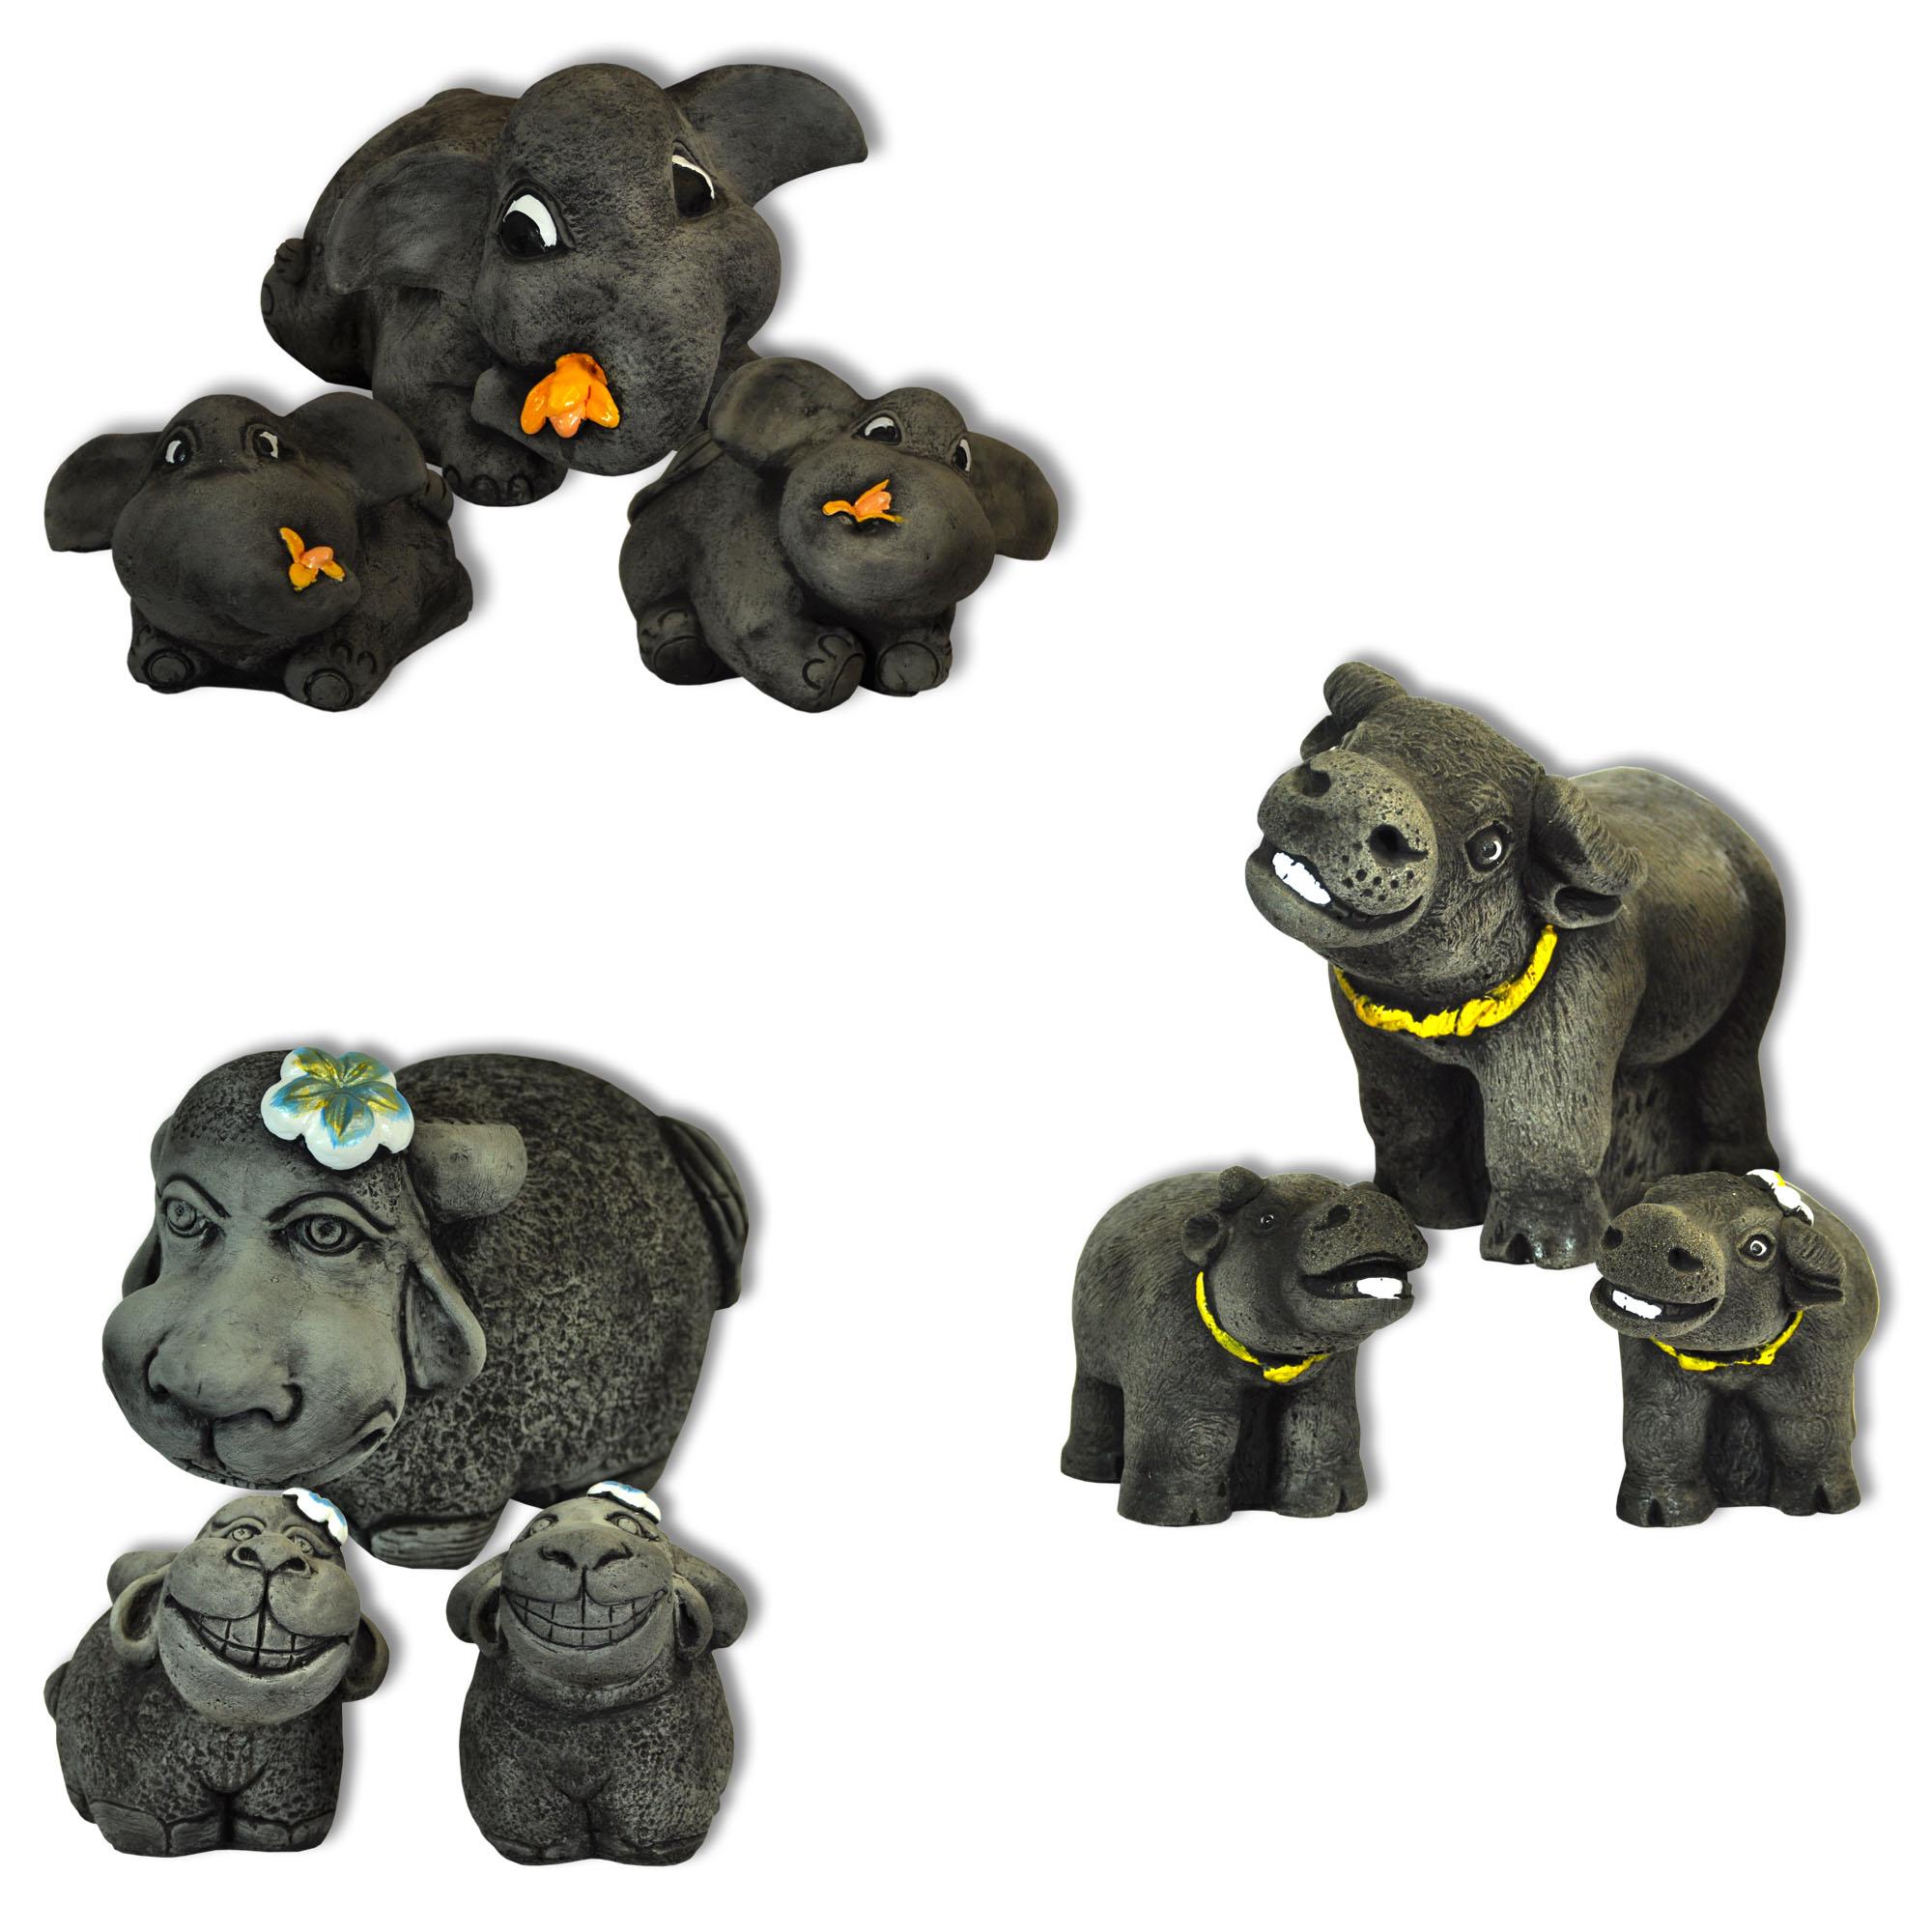 Asian animal statues